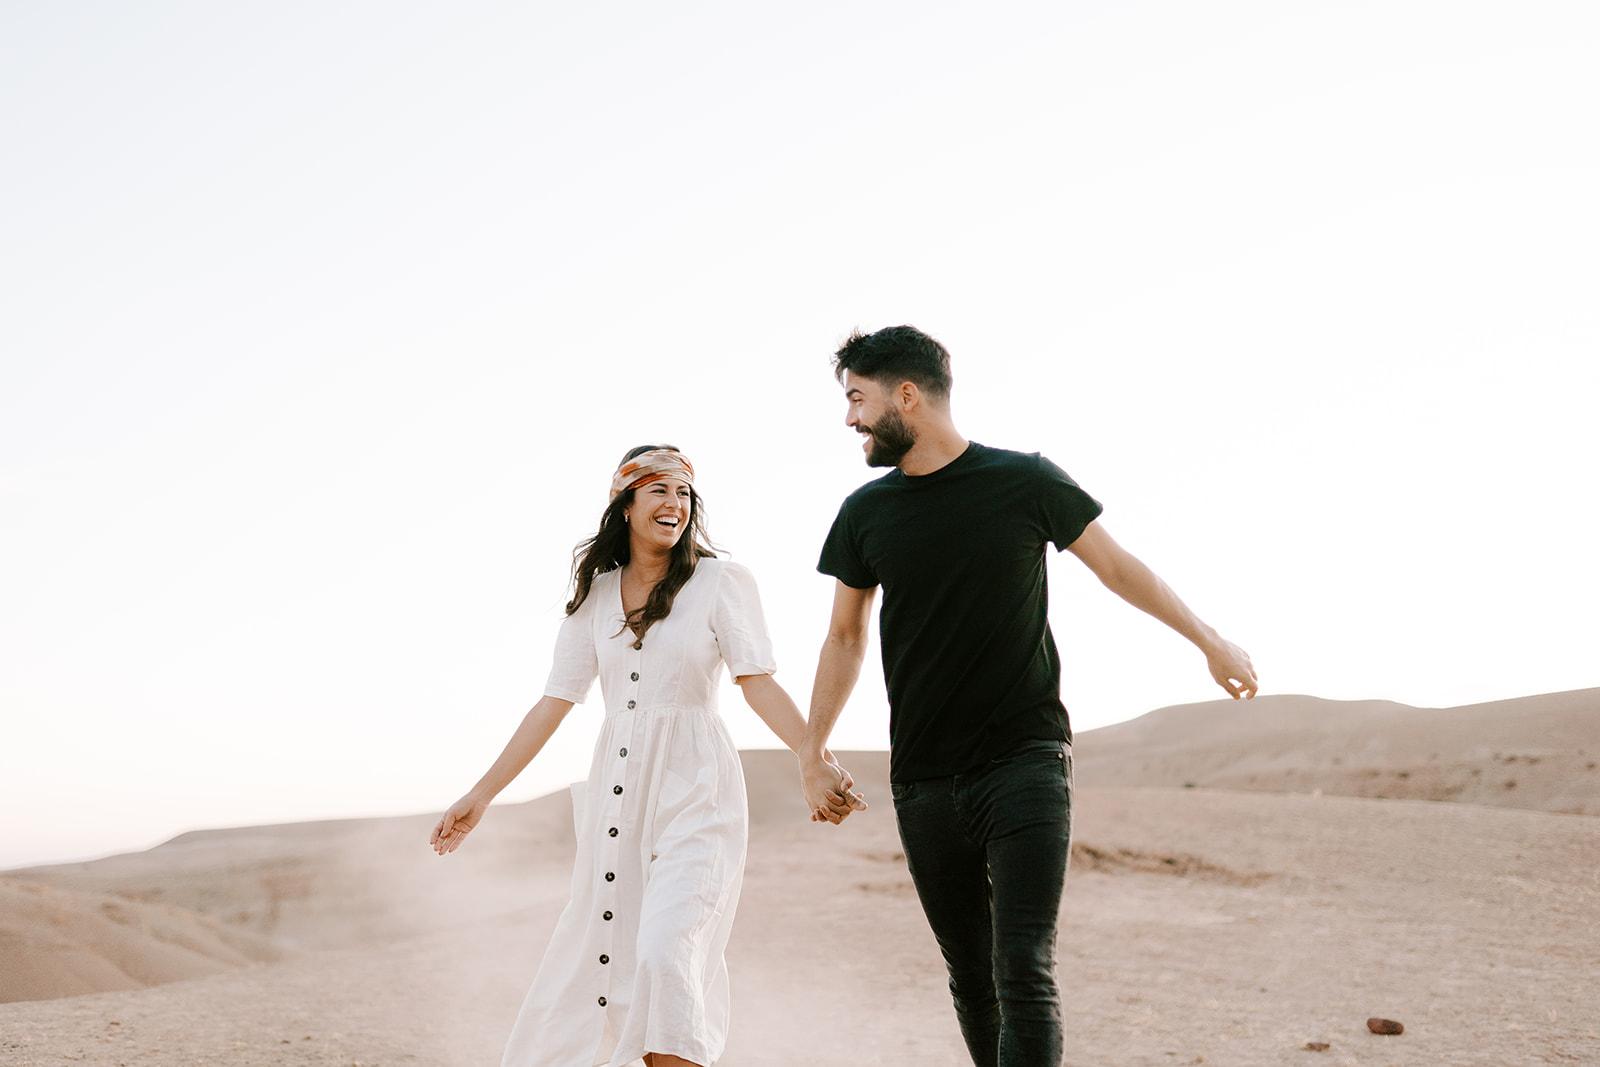 couples engagement shoot in agafay desert at marrakech